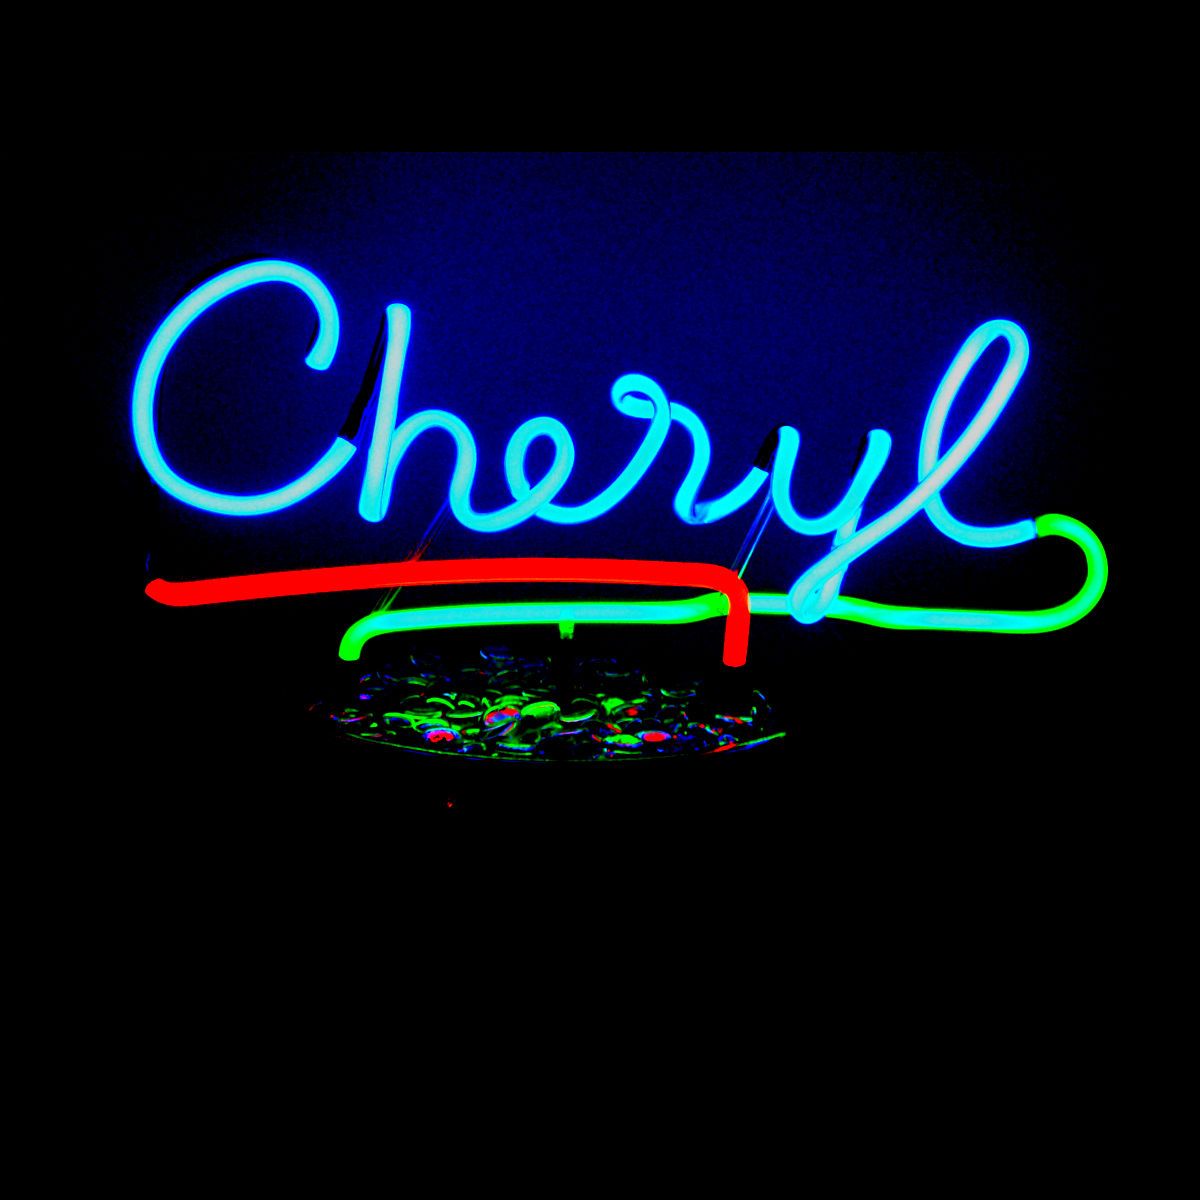 Your Name Up In Custom Neon Lights! - John Barton - Famous USA Neon Light Sculptor